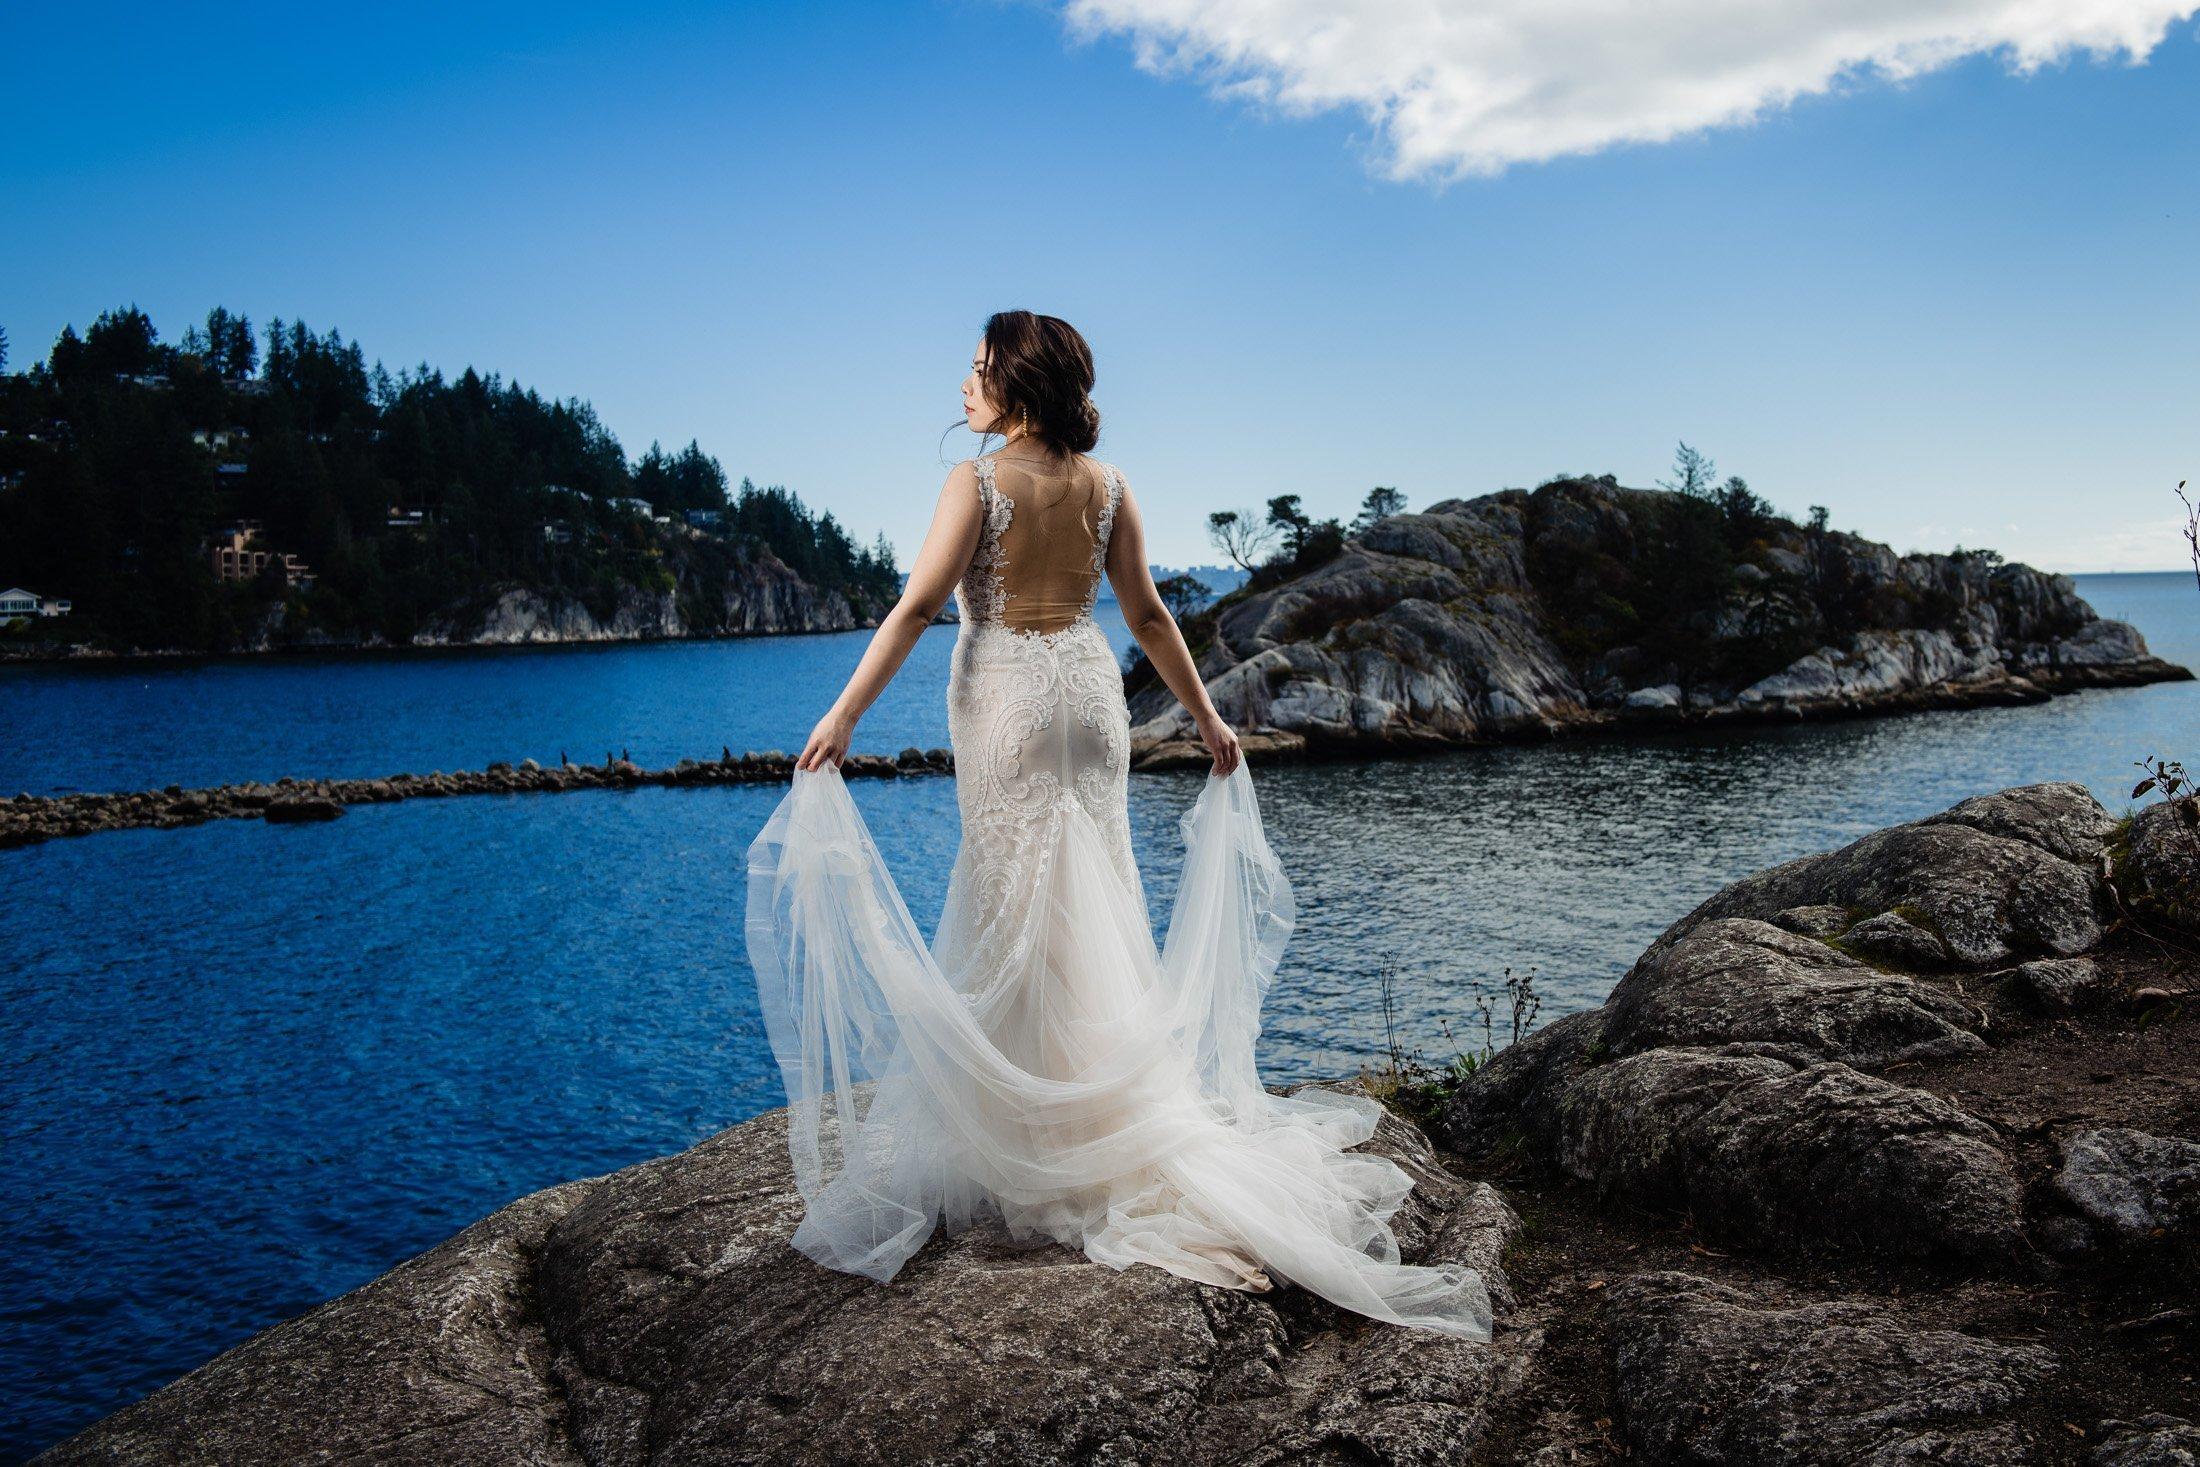 014 - whytecliff park wedding photo cliff